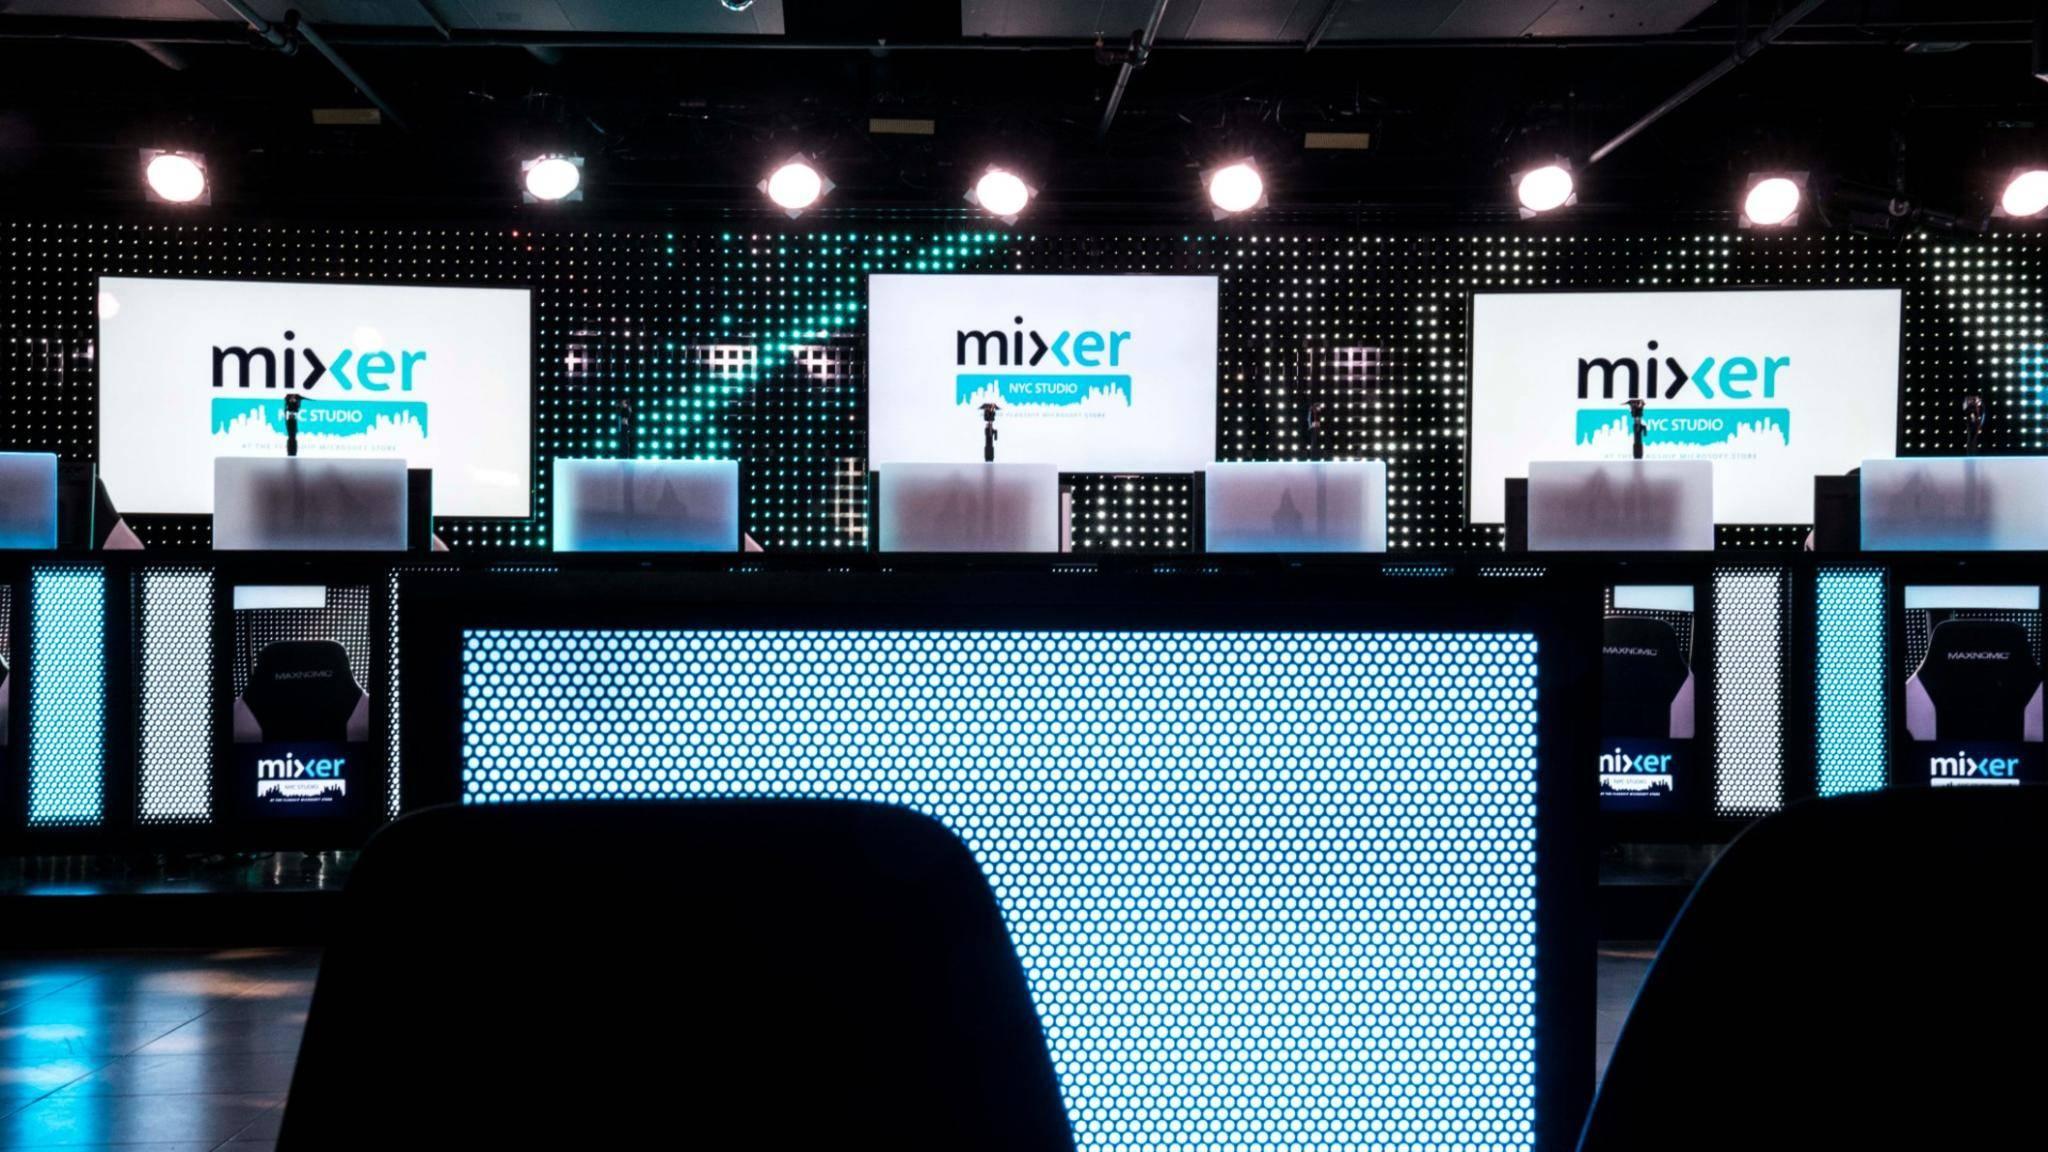 mixer-studio-foto-streamer